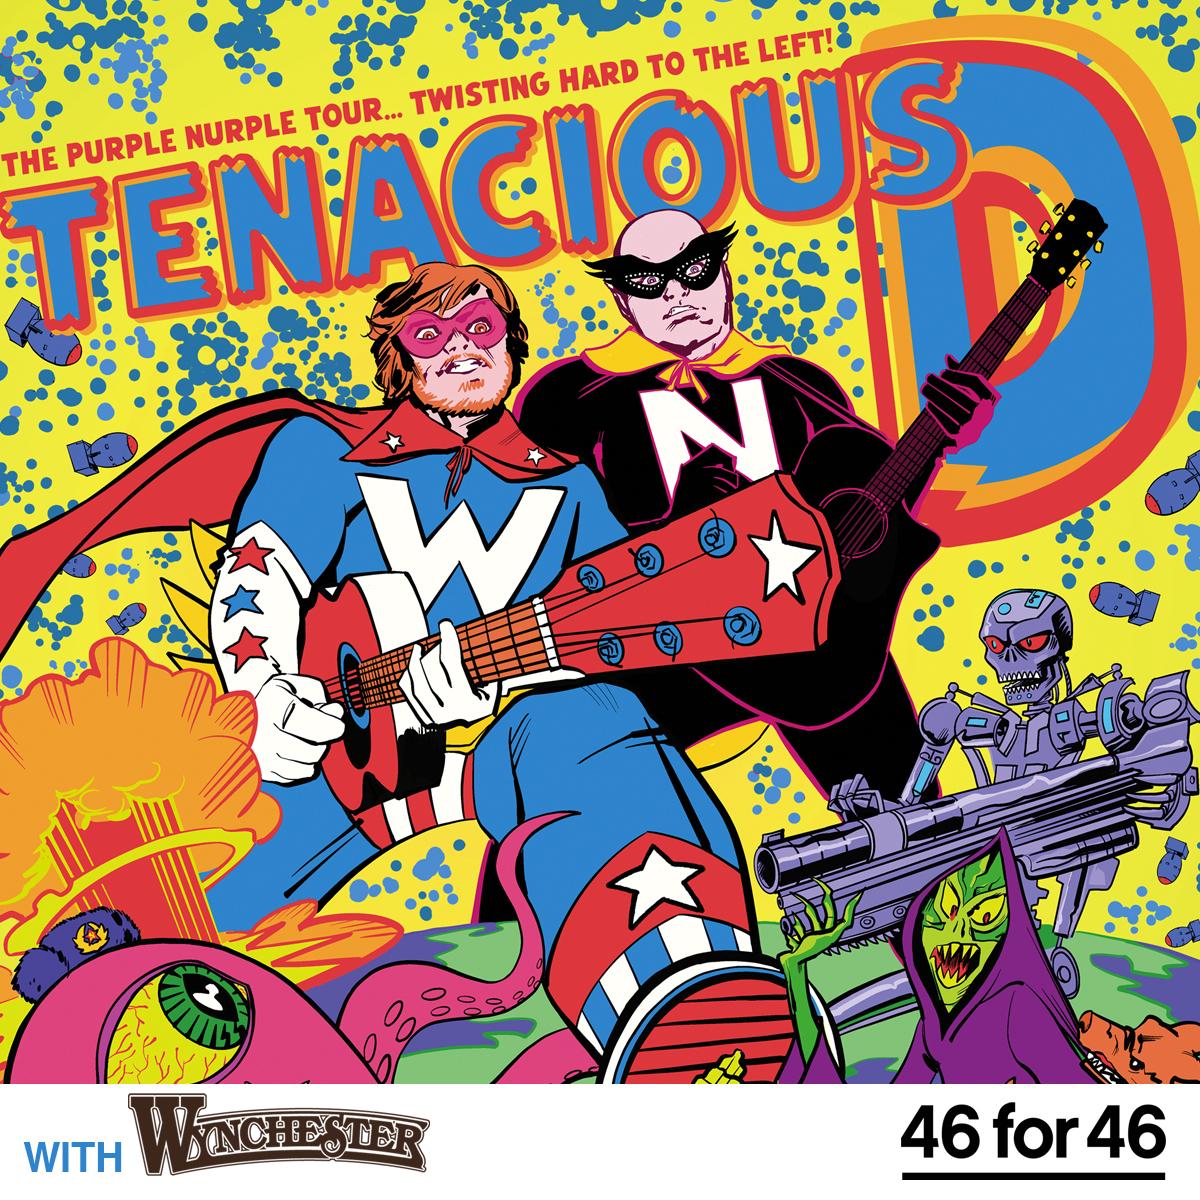 Tenacious D: The Purple Nurple Tour… Twisting Hard to the Left!